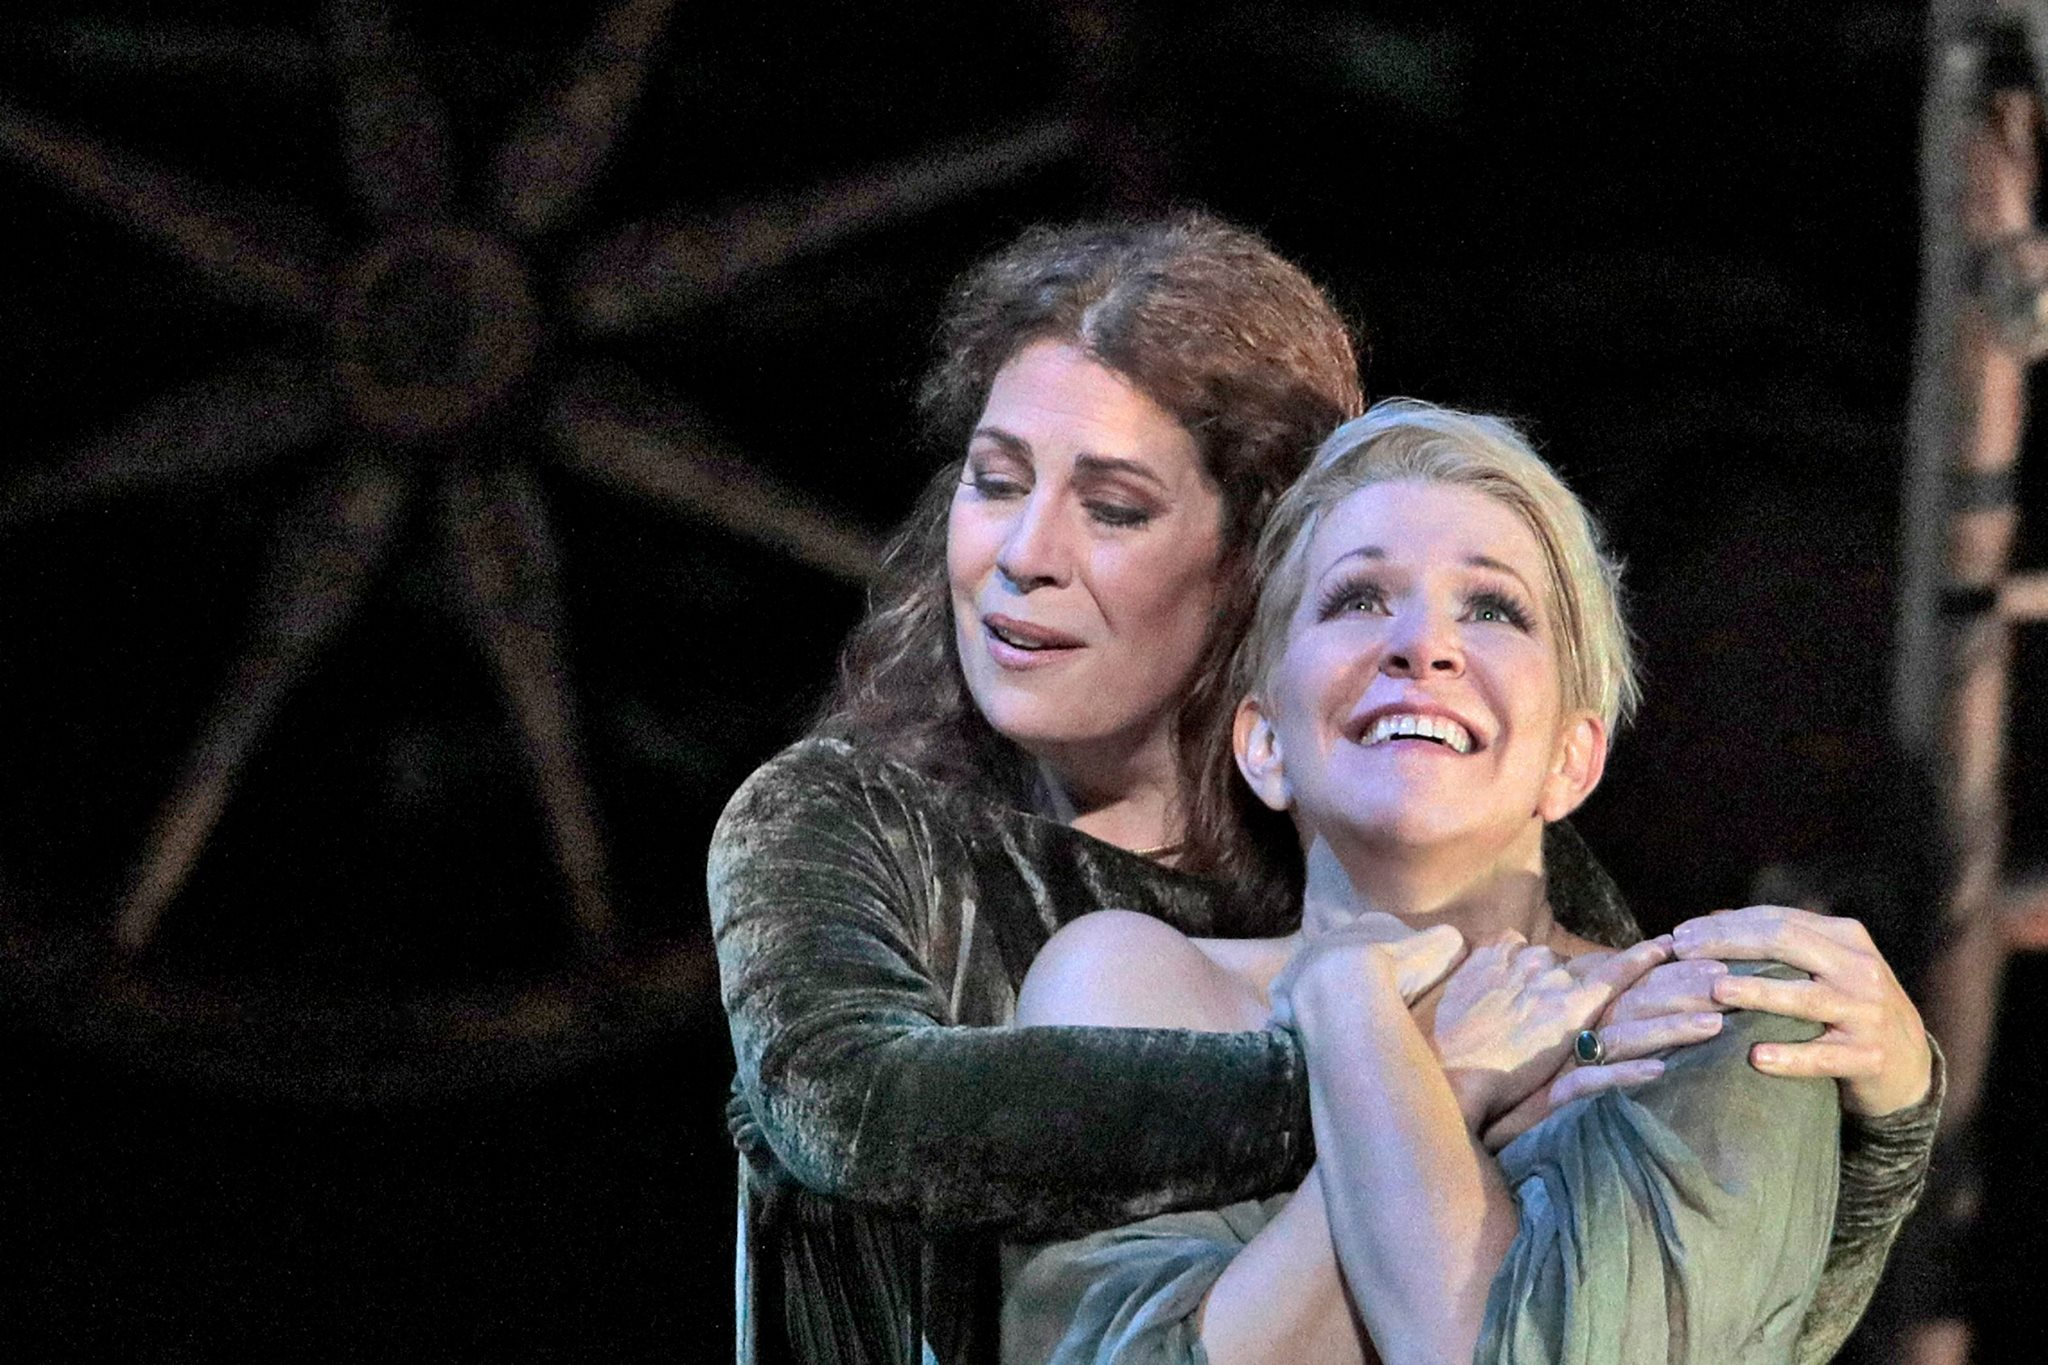 Sondra Radvanovsky as Norma and Joyce DiDonato as Adalgisa. Photo by Ken Howard and courtesy of the Metropolitan Opera.